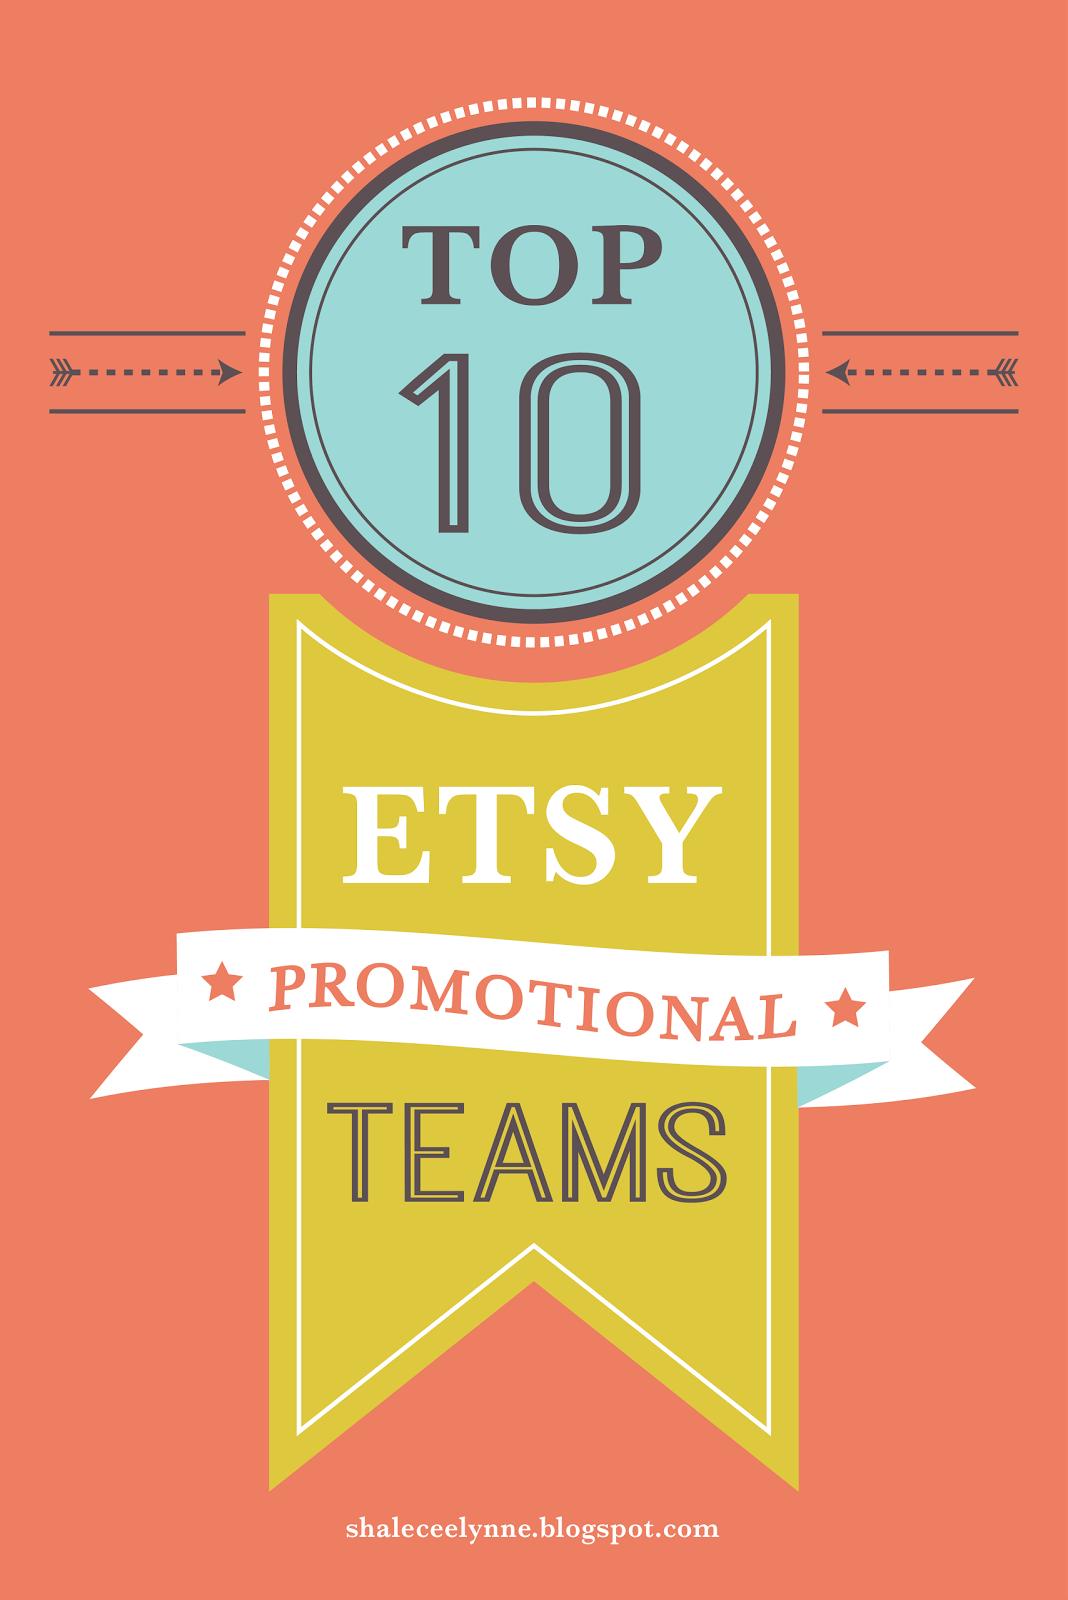 Top Ten Etsy Promotional Teams | Shalece Elynne Art